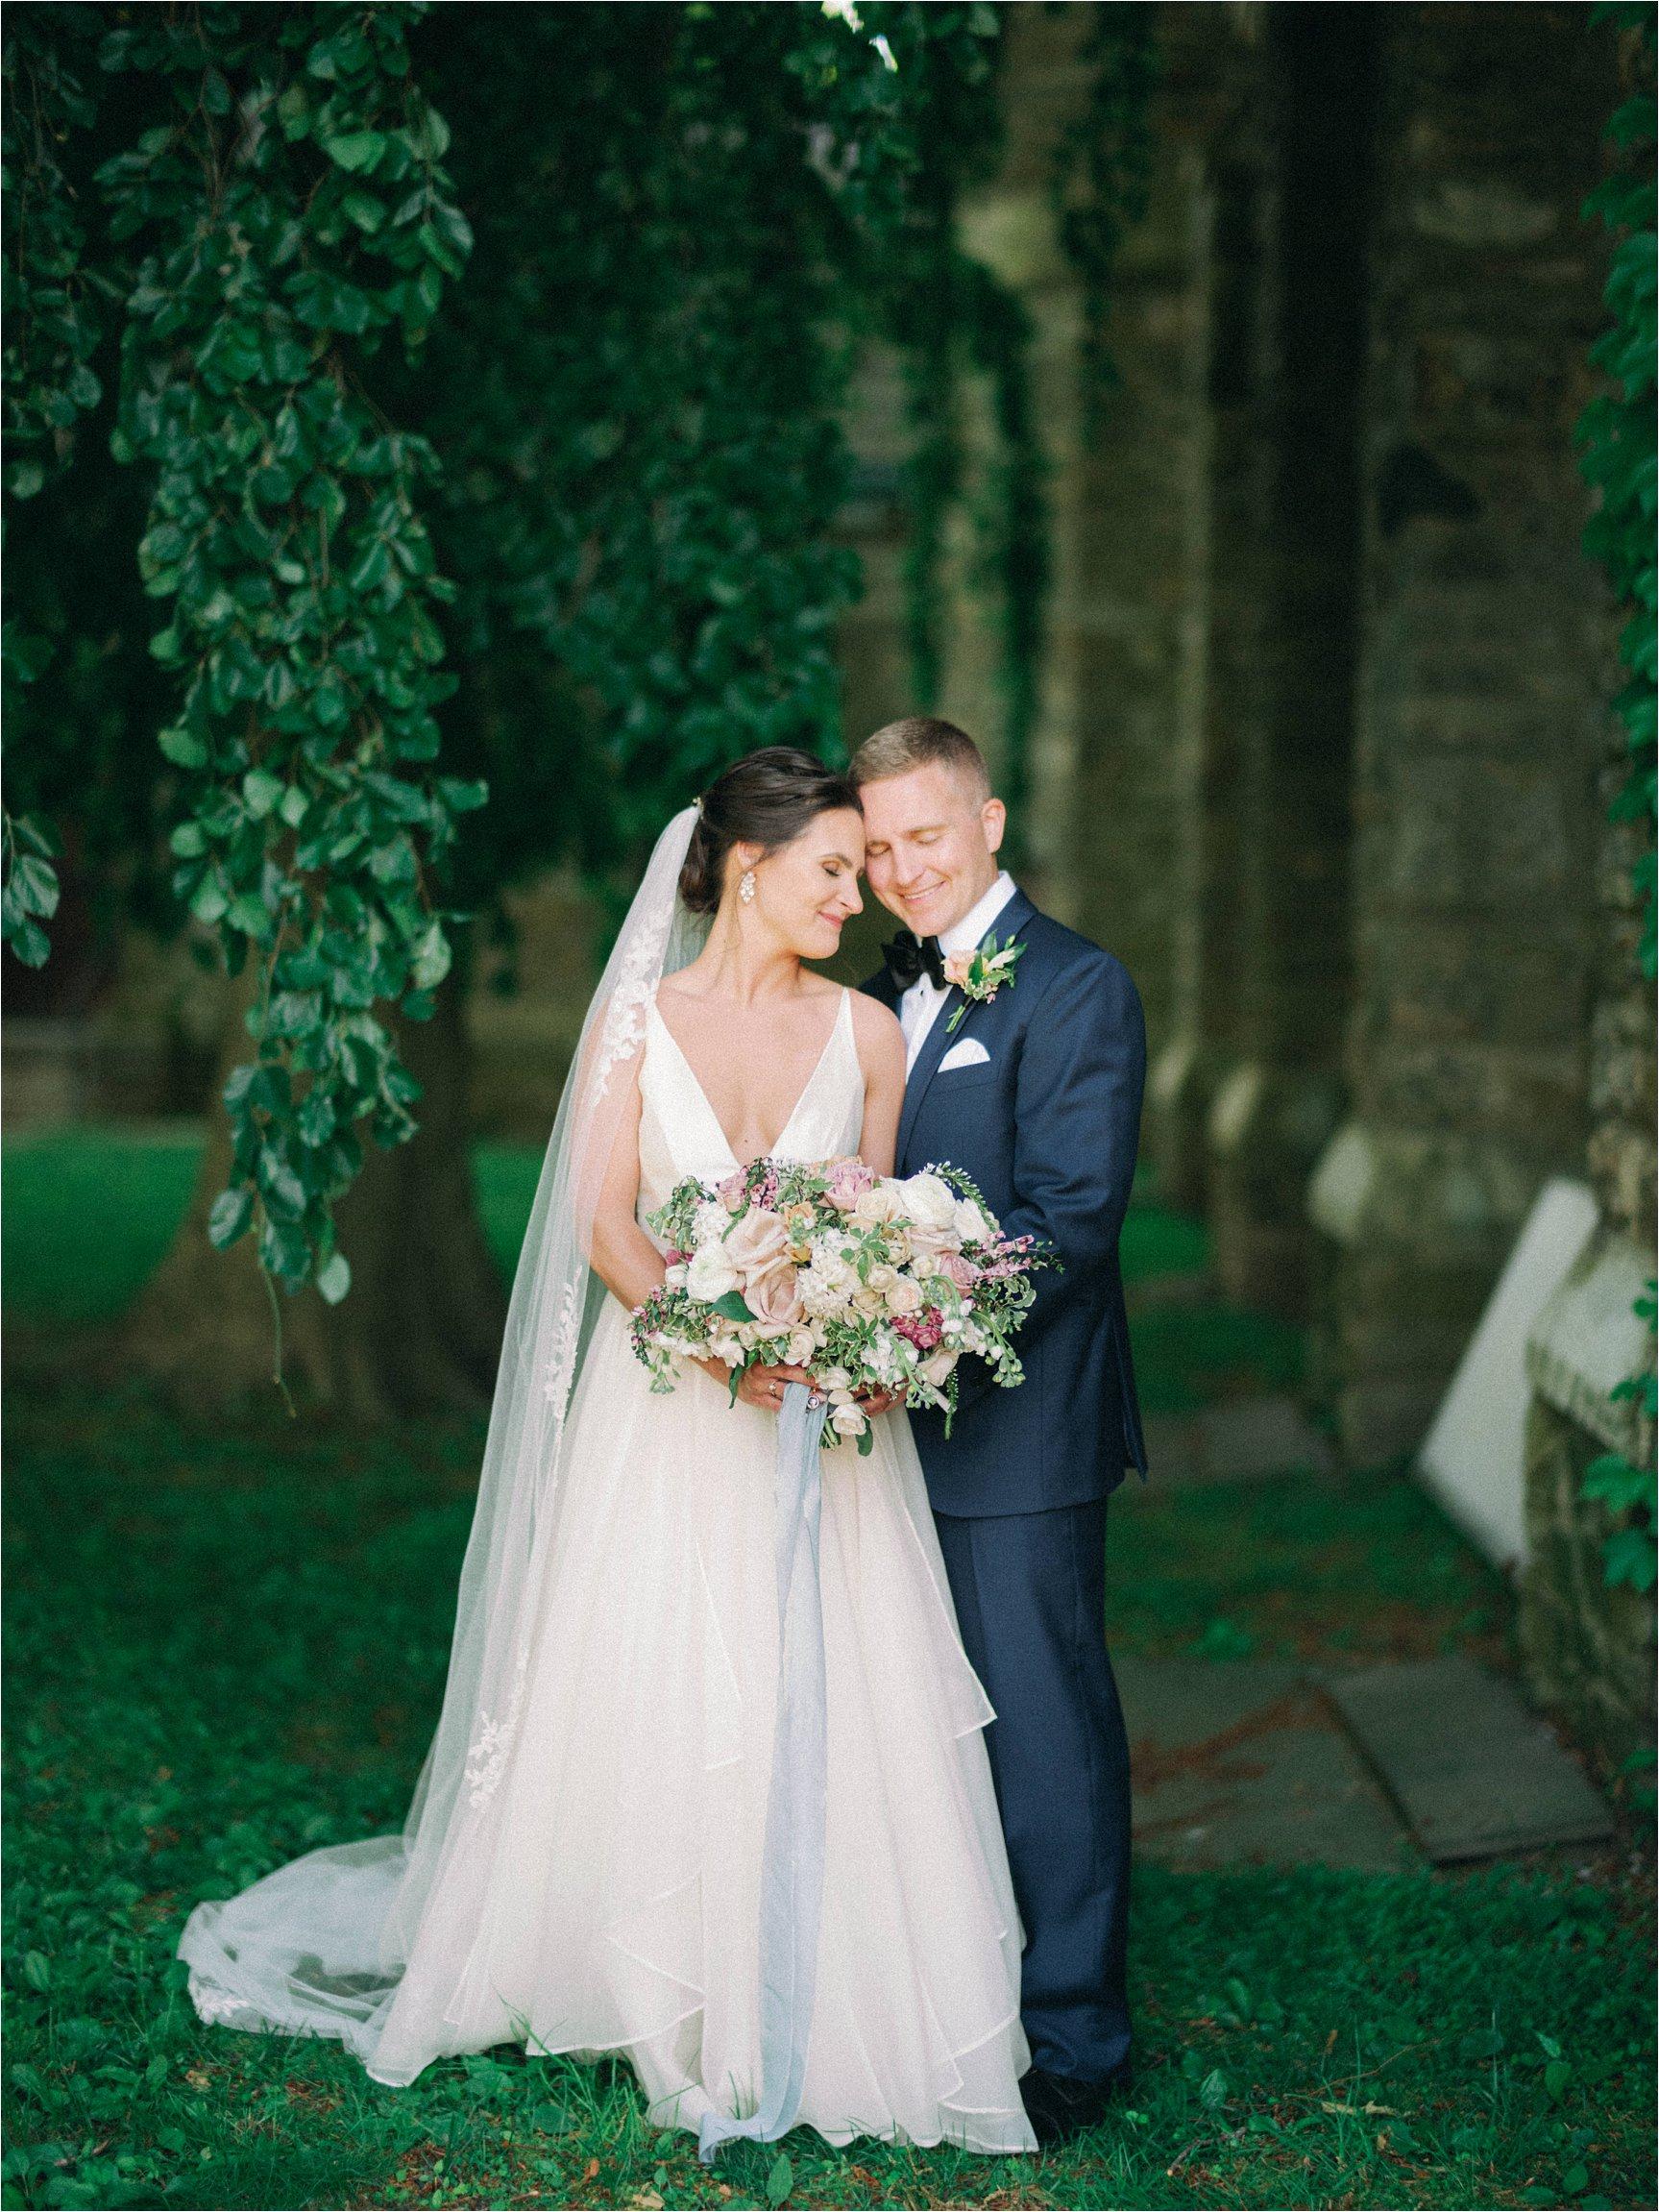 Lord_Thompson_Manor_Wedding090.JPG